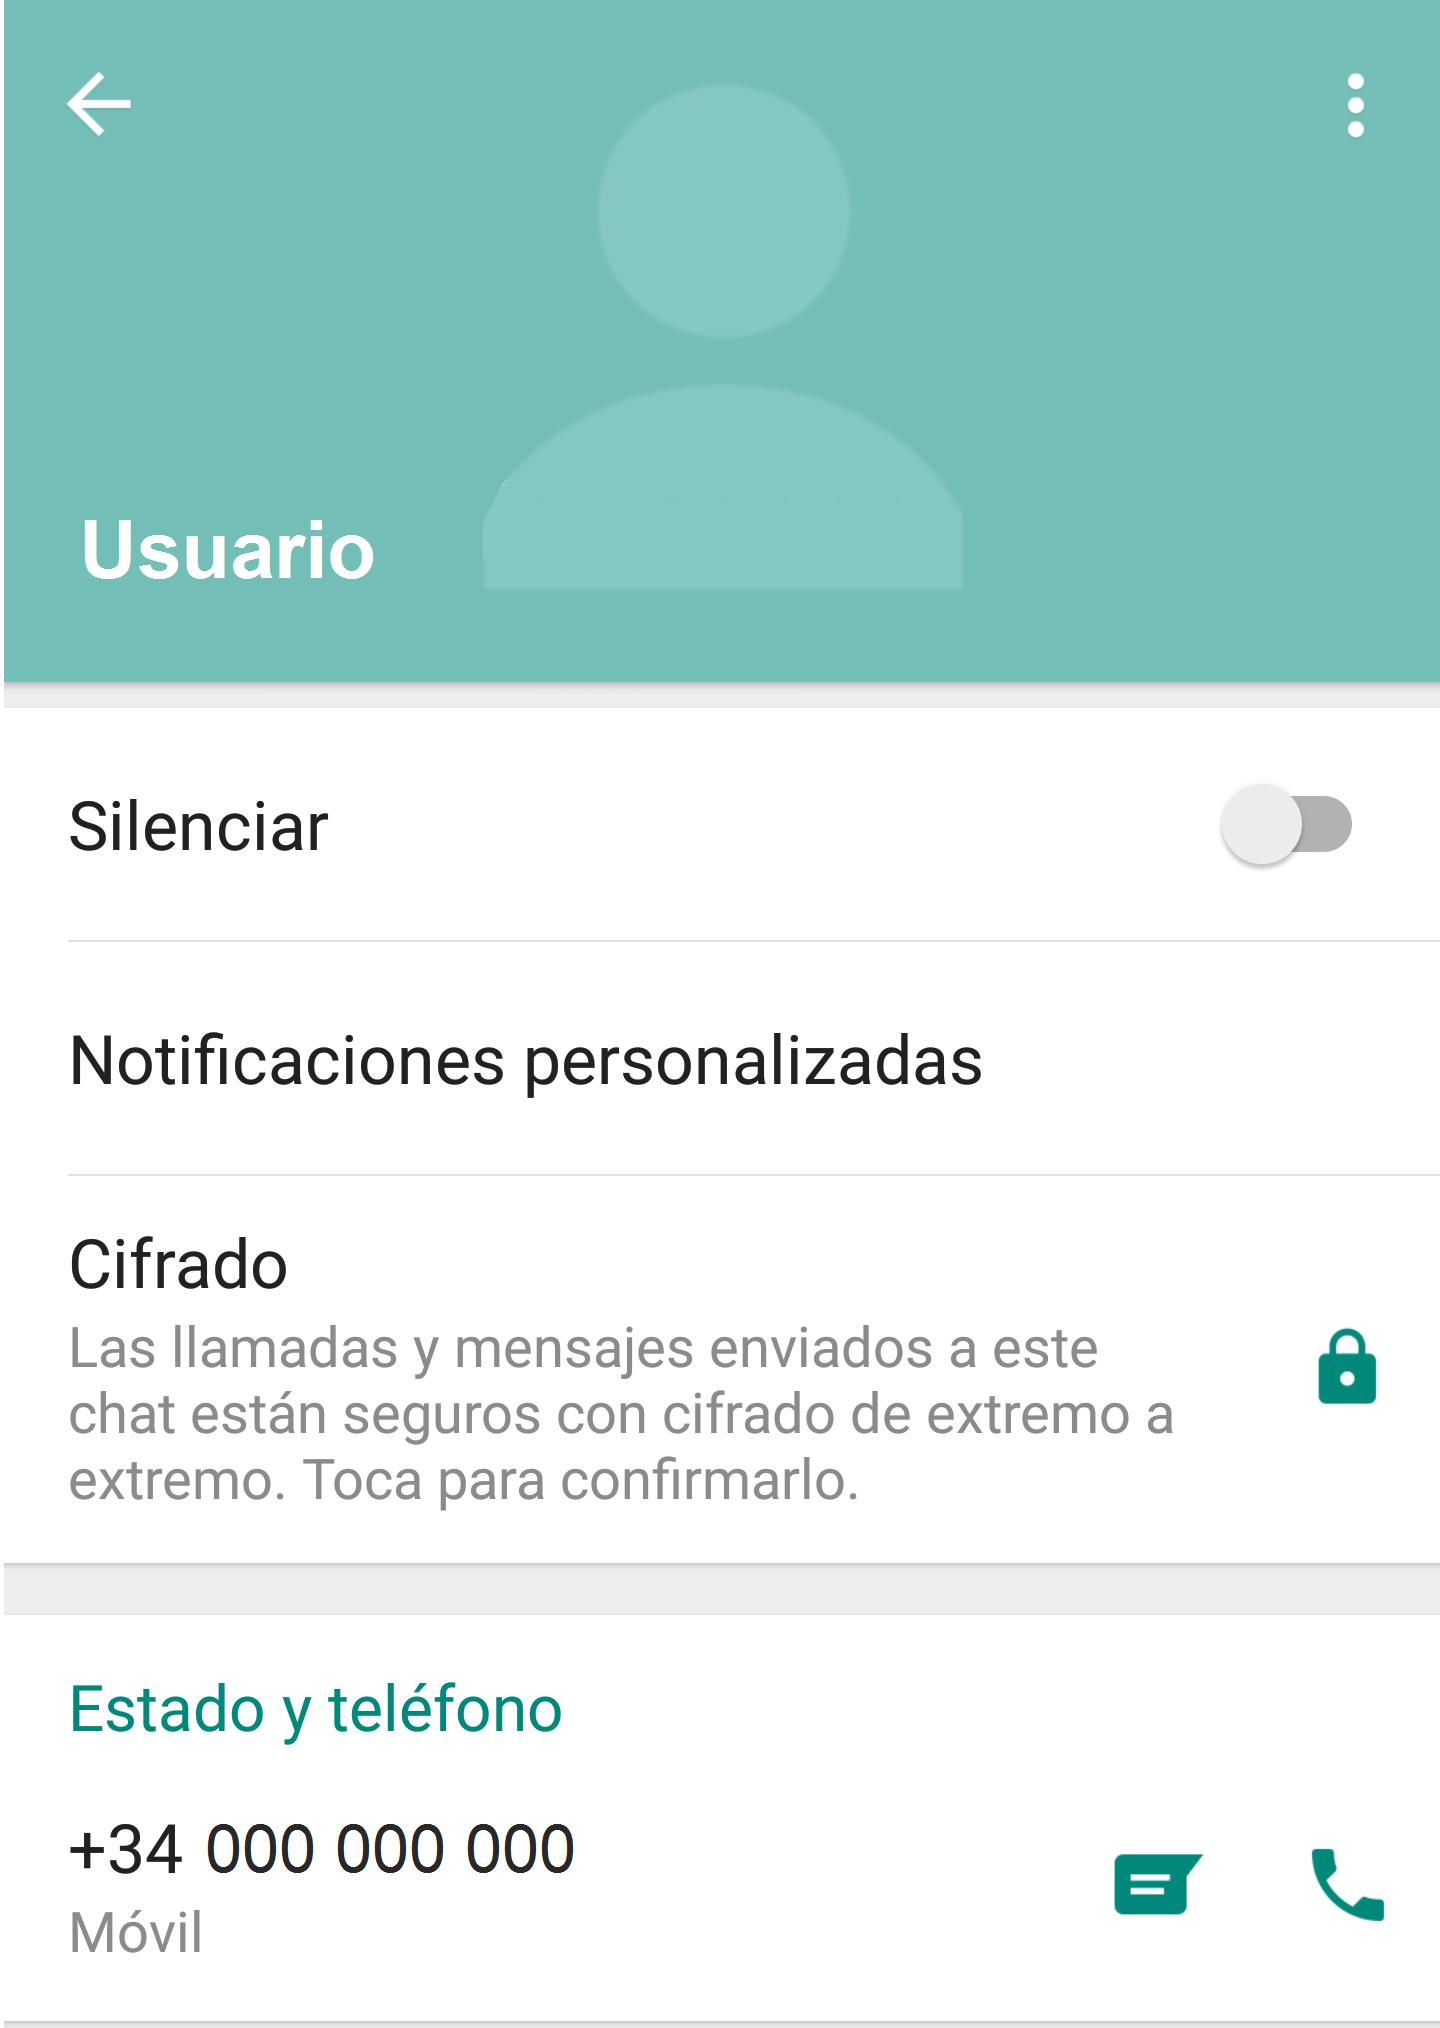 bloqueado_en_whatsapp_perfil_estado